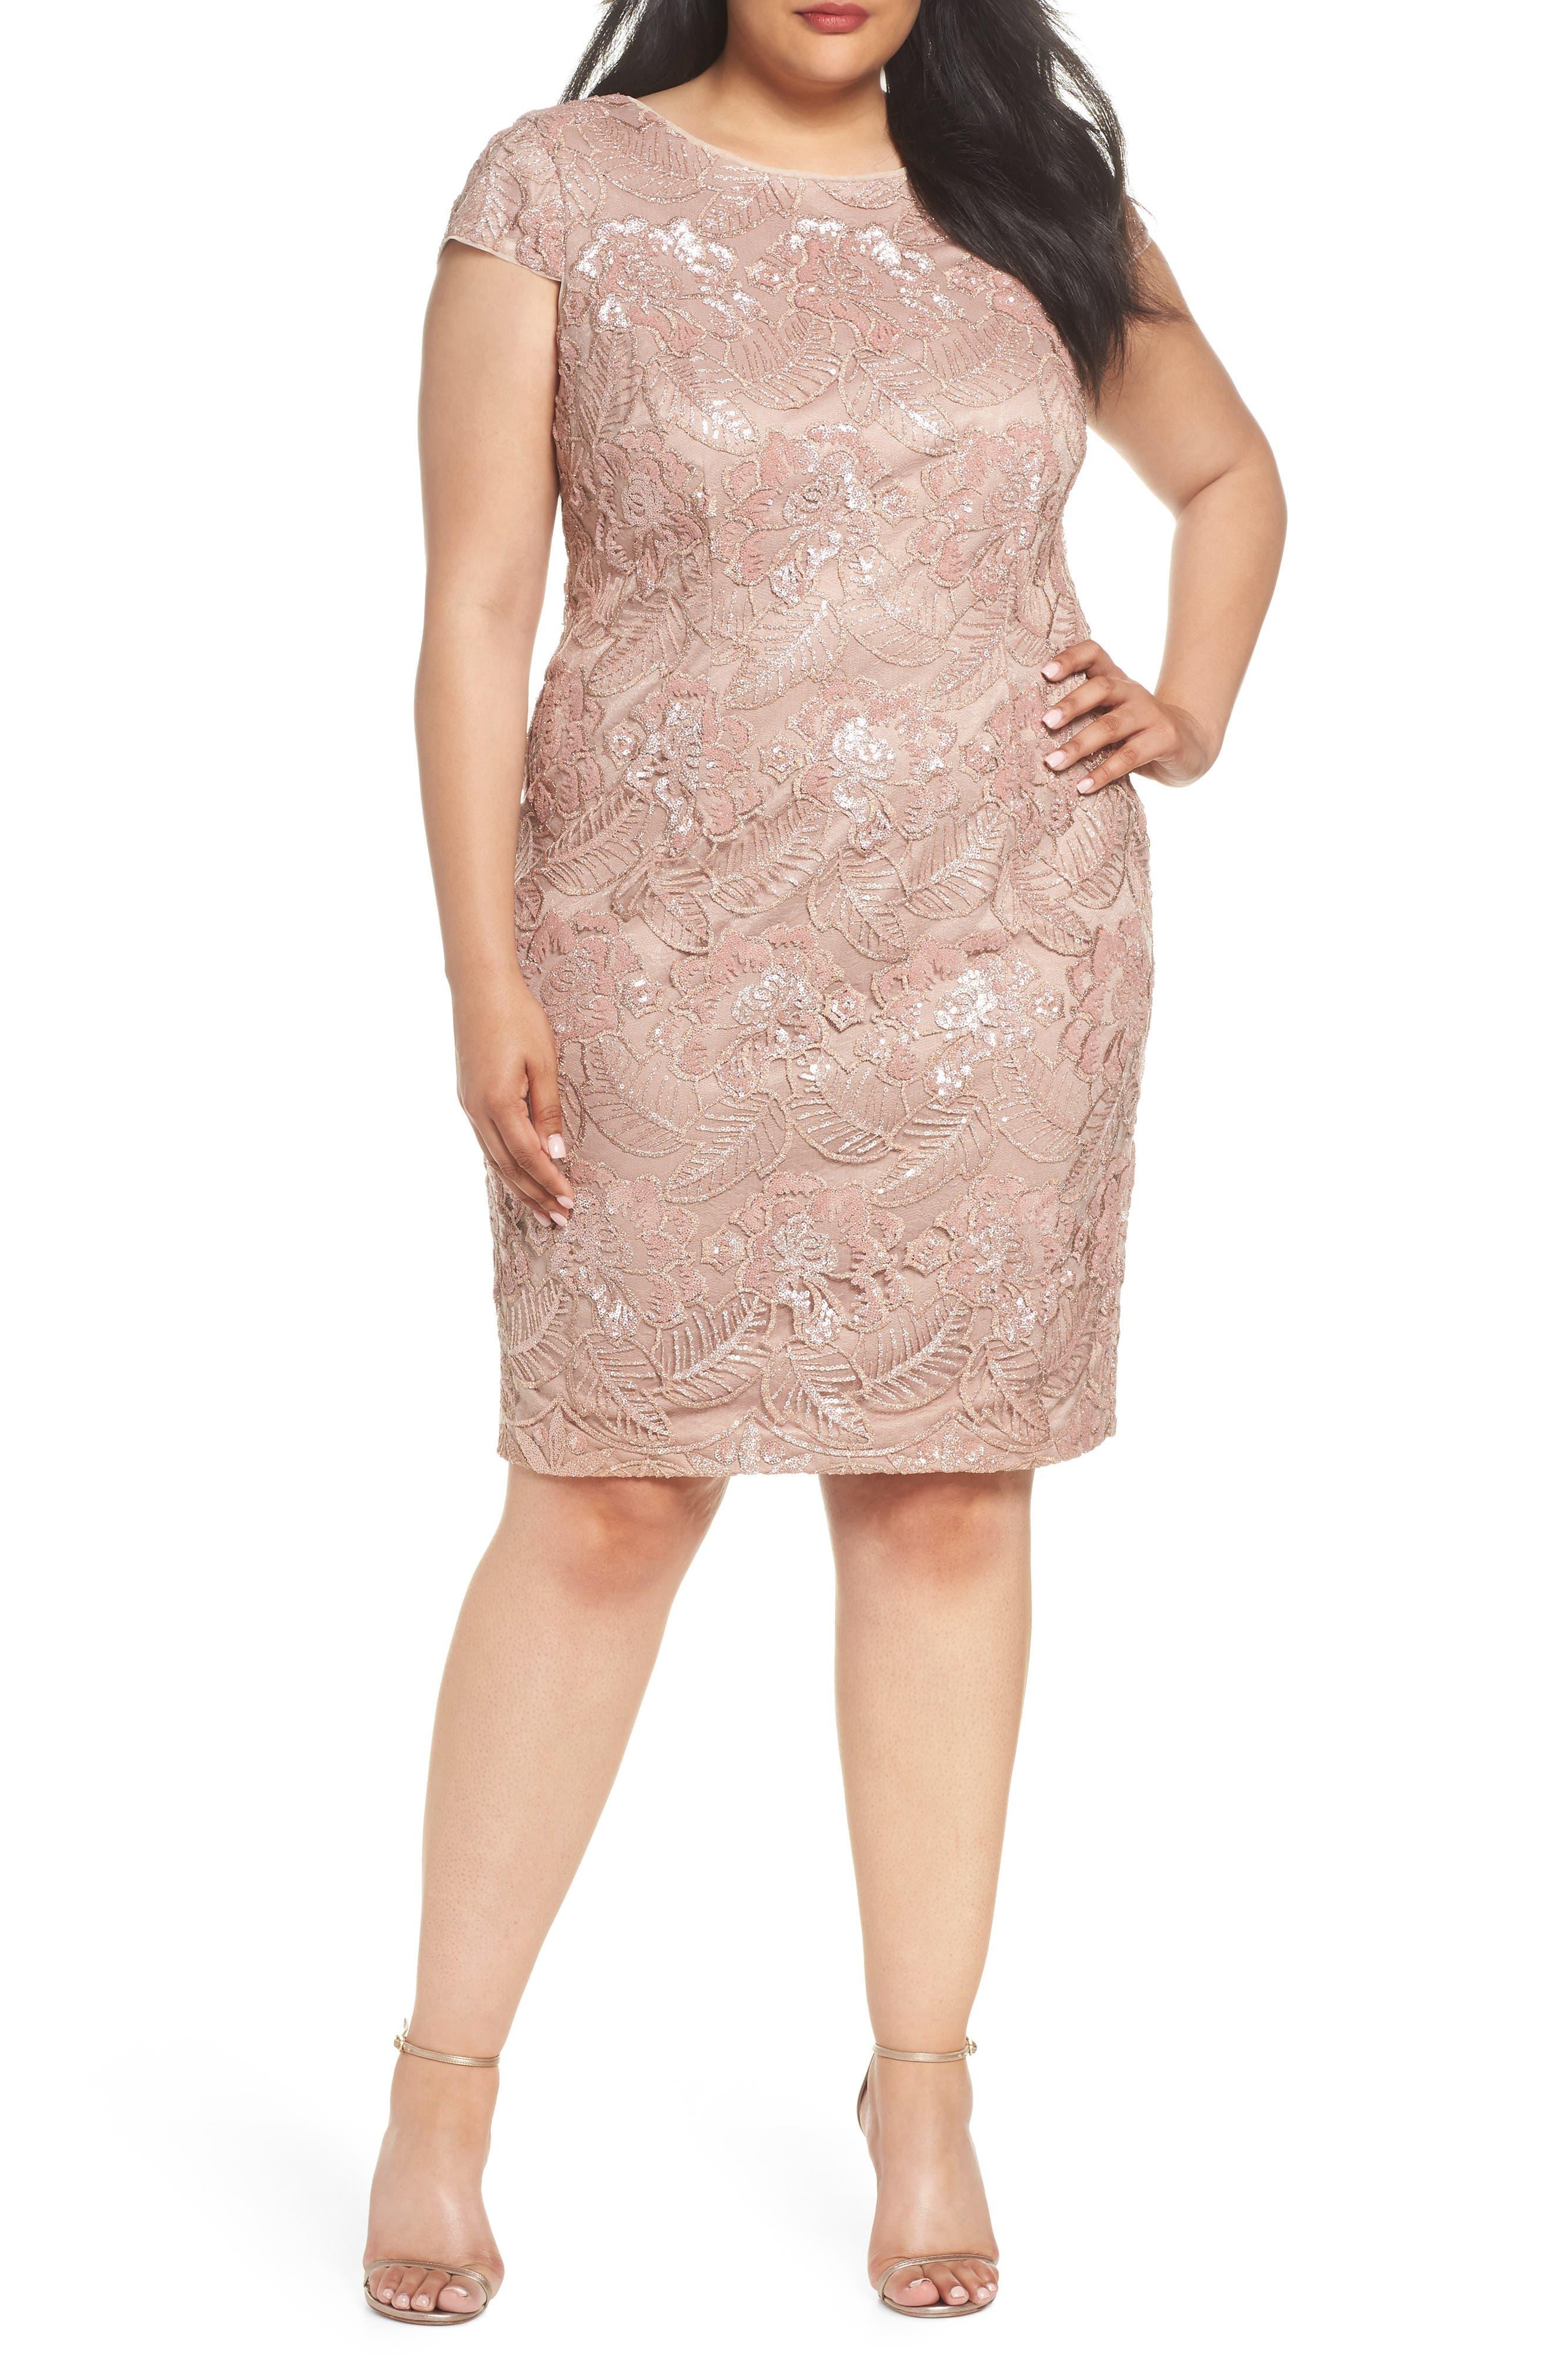 Sequin Lace Cocktail Dress,                         Main,                         color, ROSE GOLD